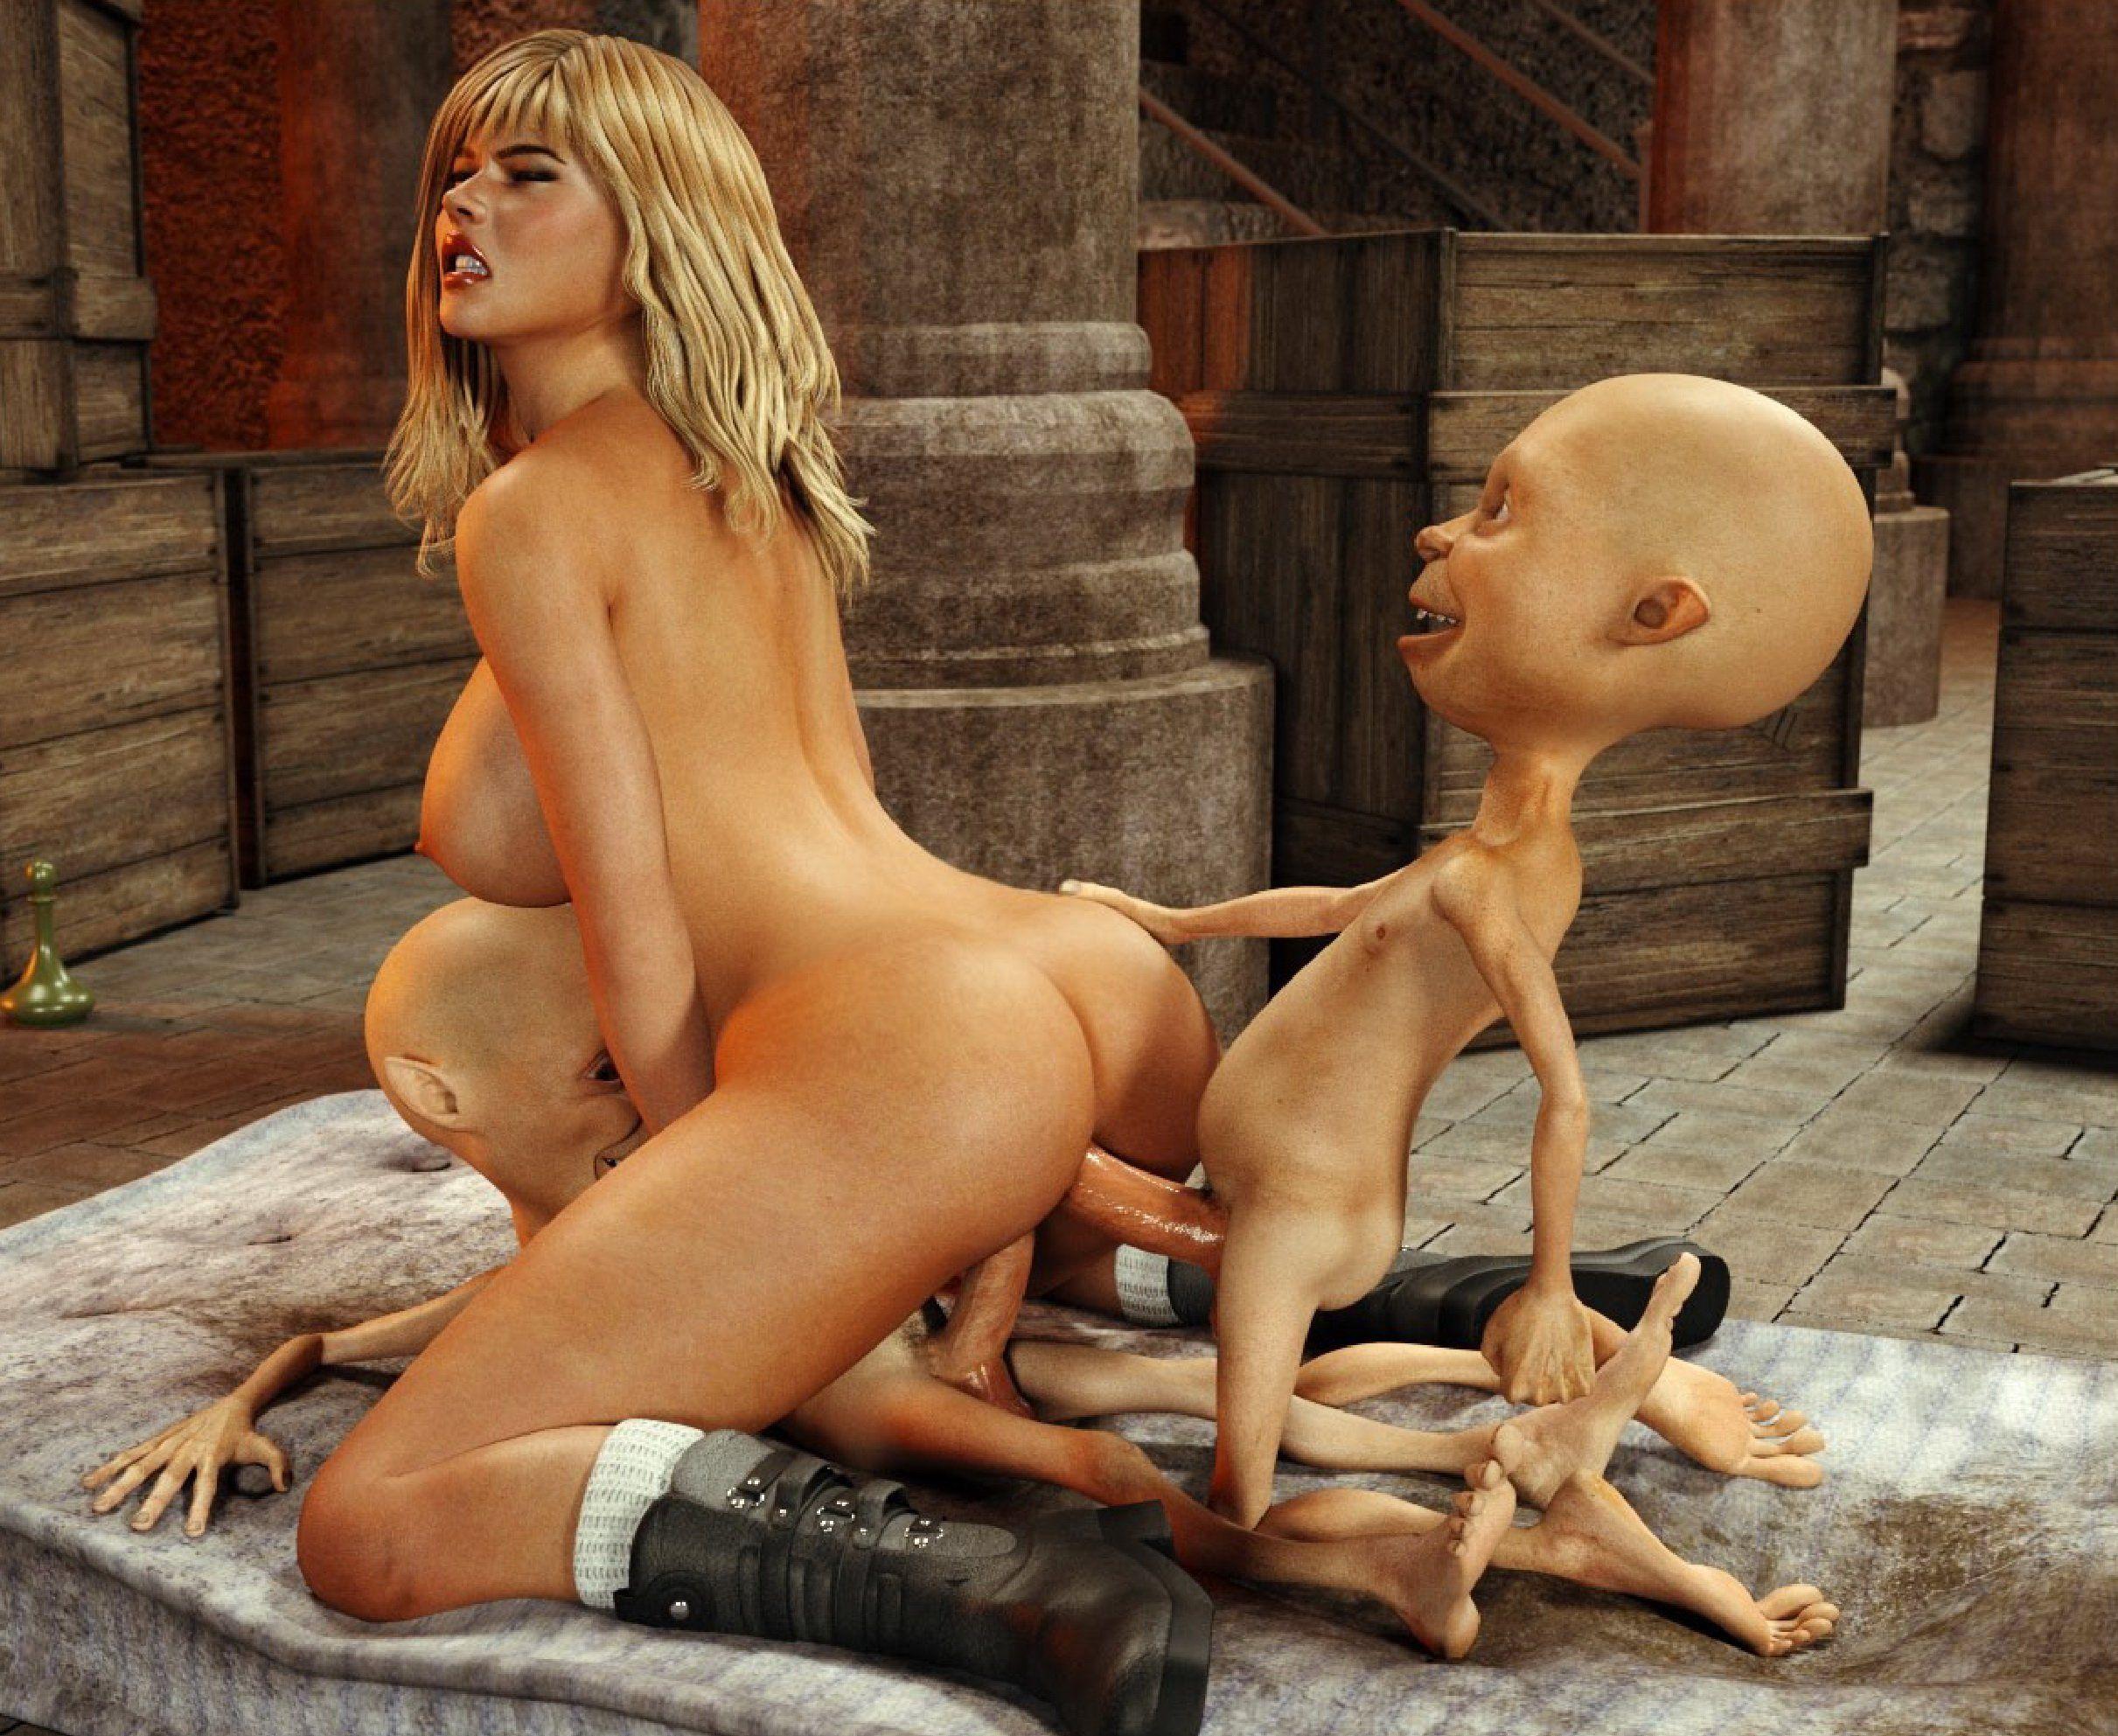 Alain Porn Woman alien fuck real girl . porn images. comments: 3